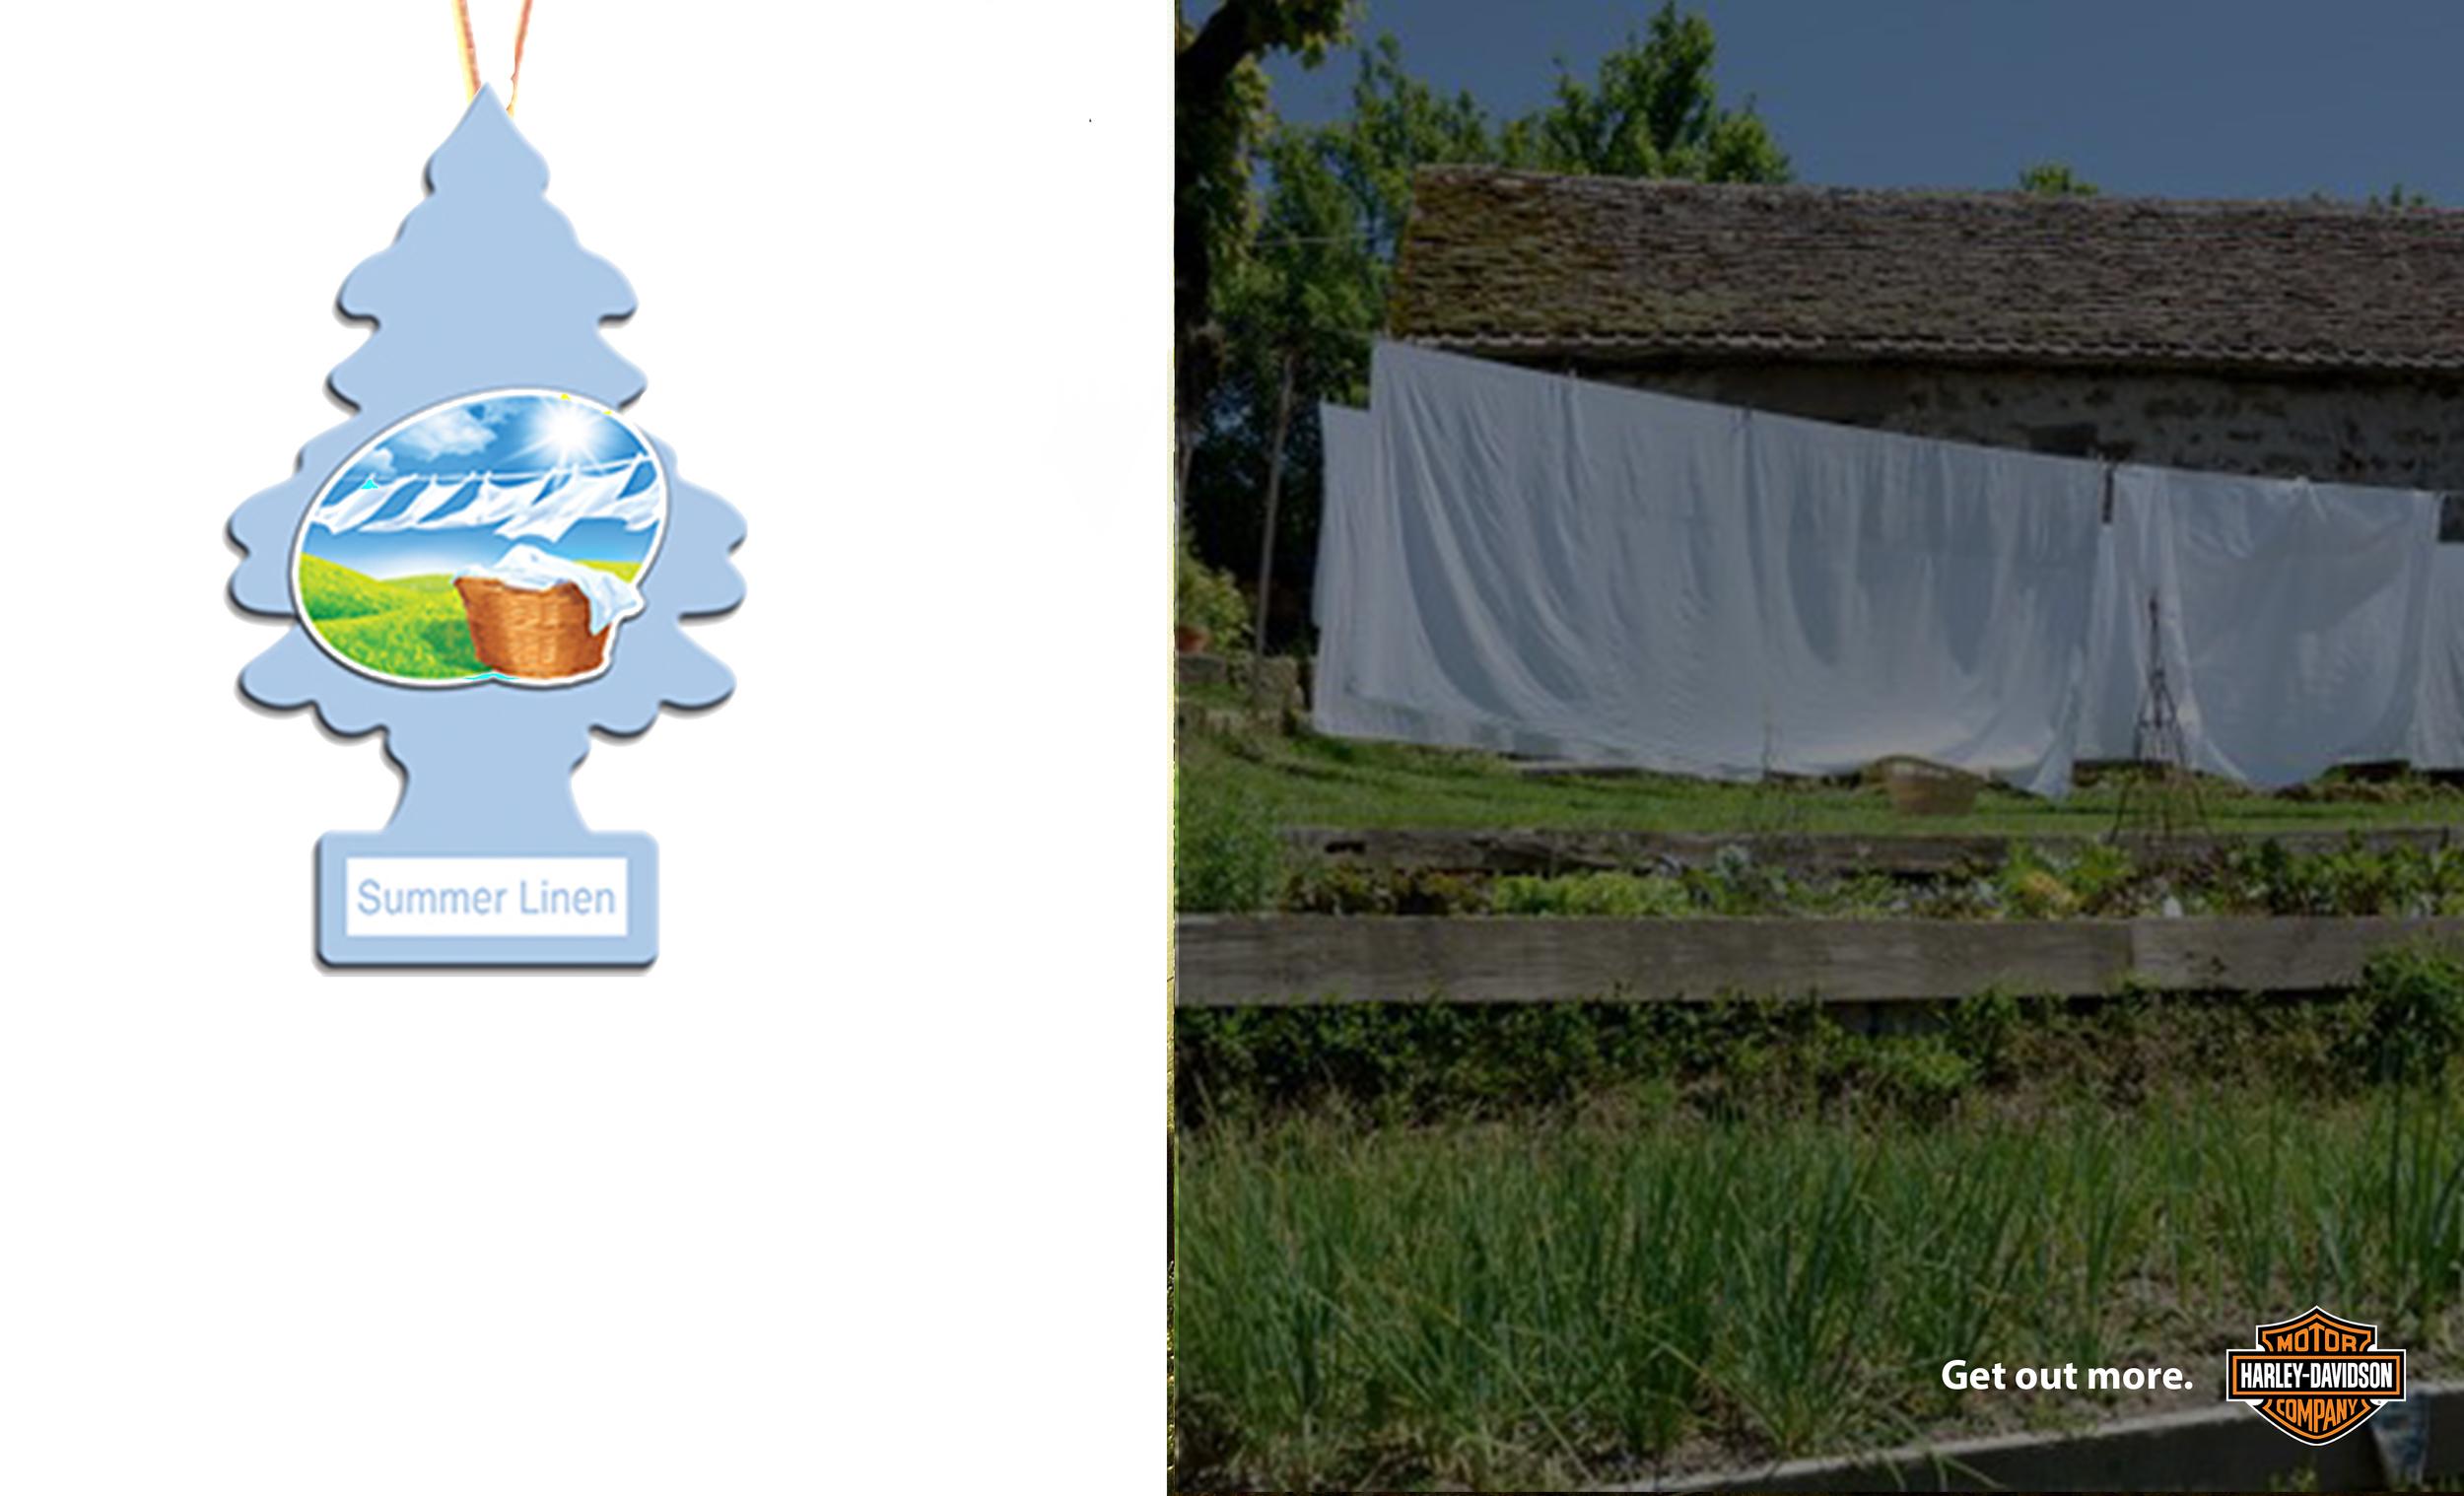 harley-Getoutmore-linens.jpg